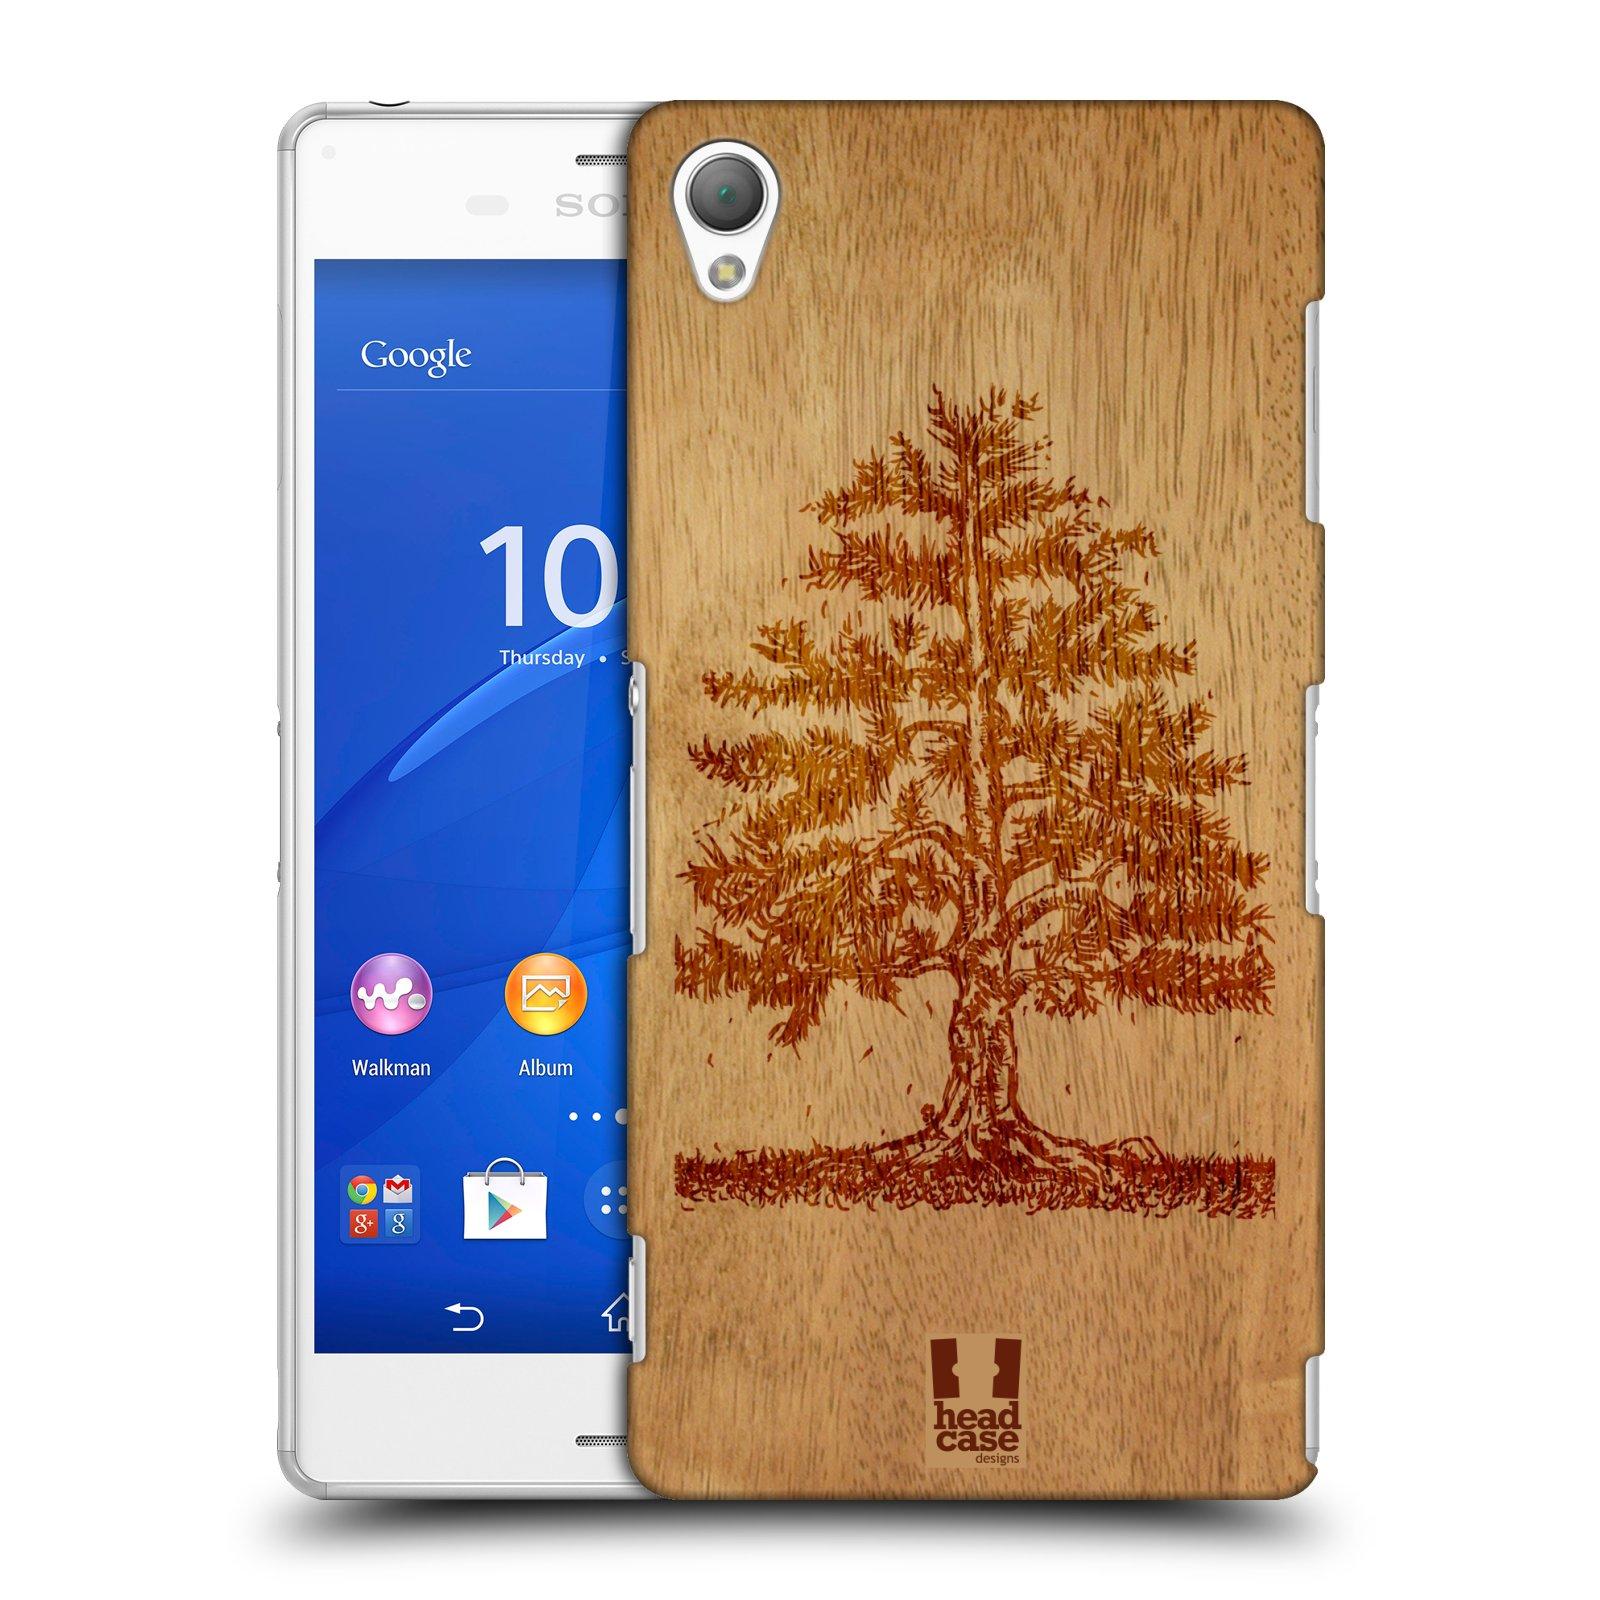 Plastové pouzdro na mobil Sony Xperia Z3 D6603 HEAD CASE WOODART TREE